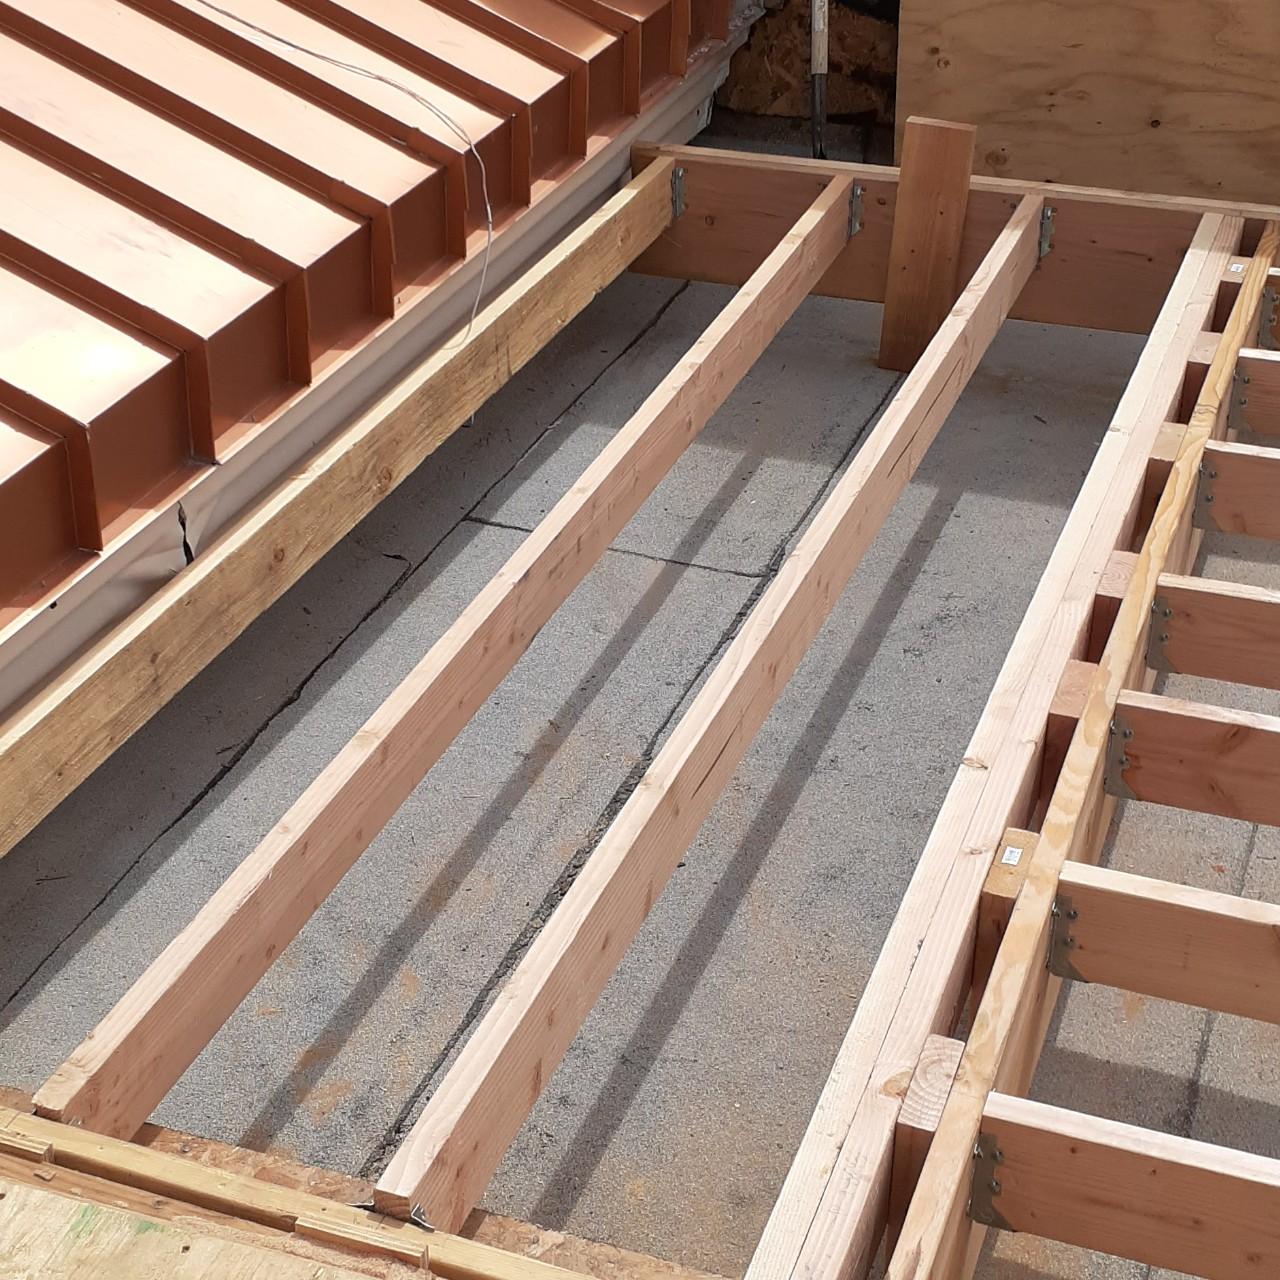 carpentry-wood-framing-second-floor-home-addition--framing-81